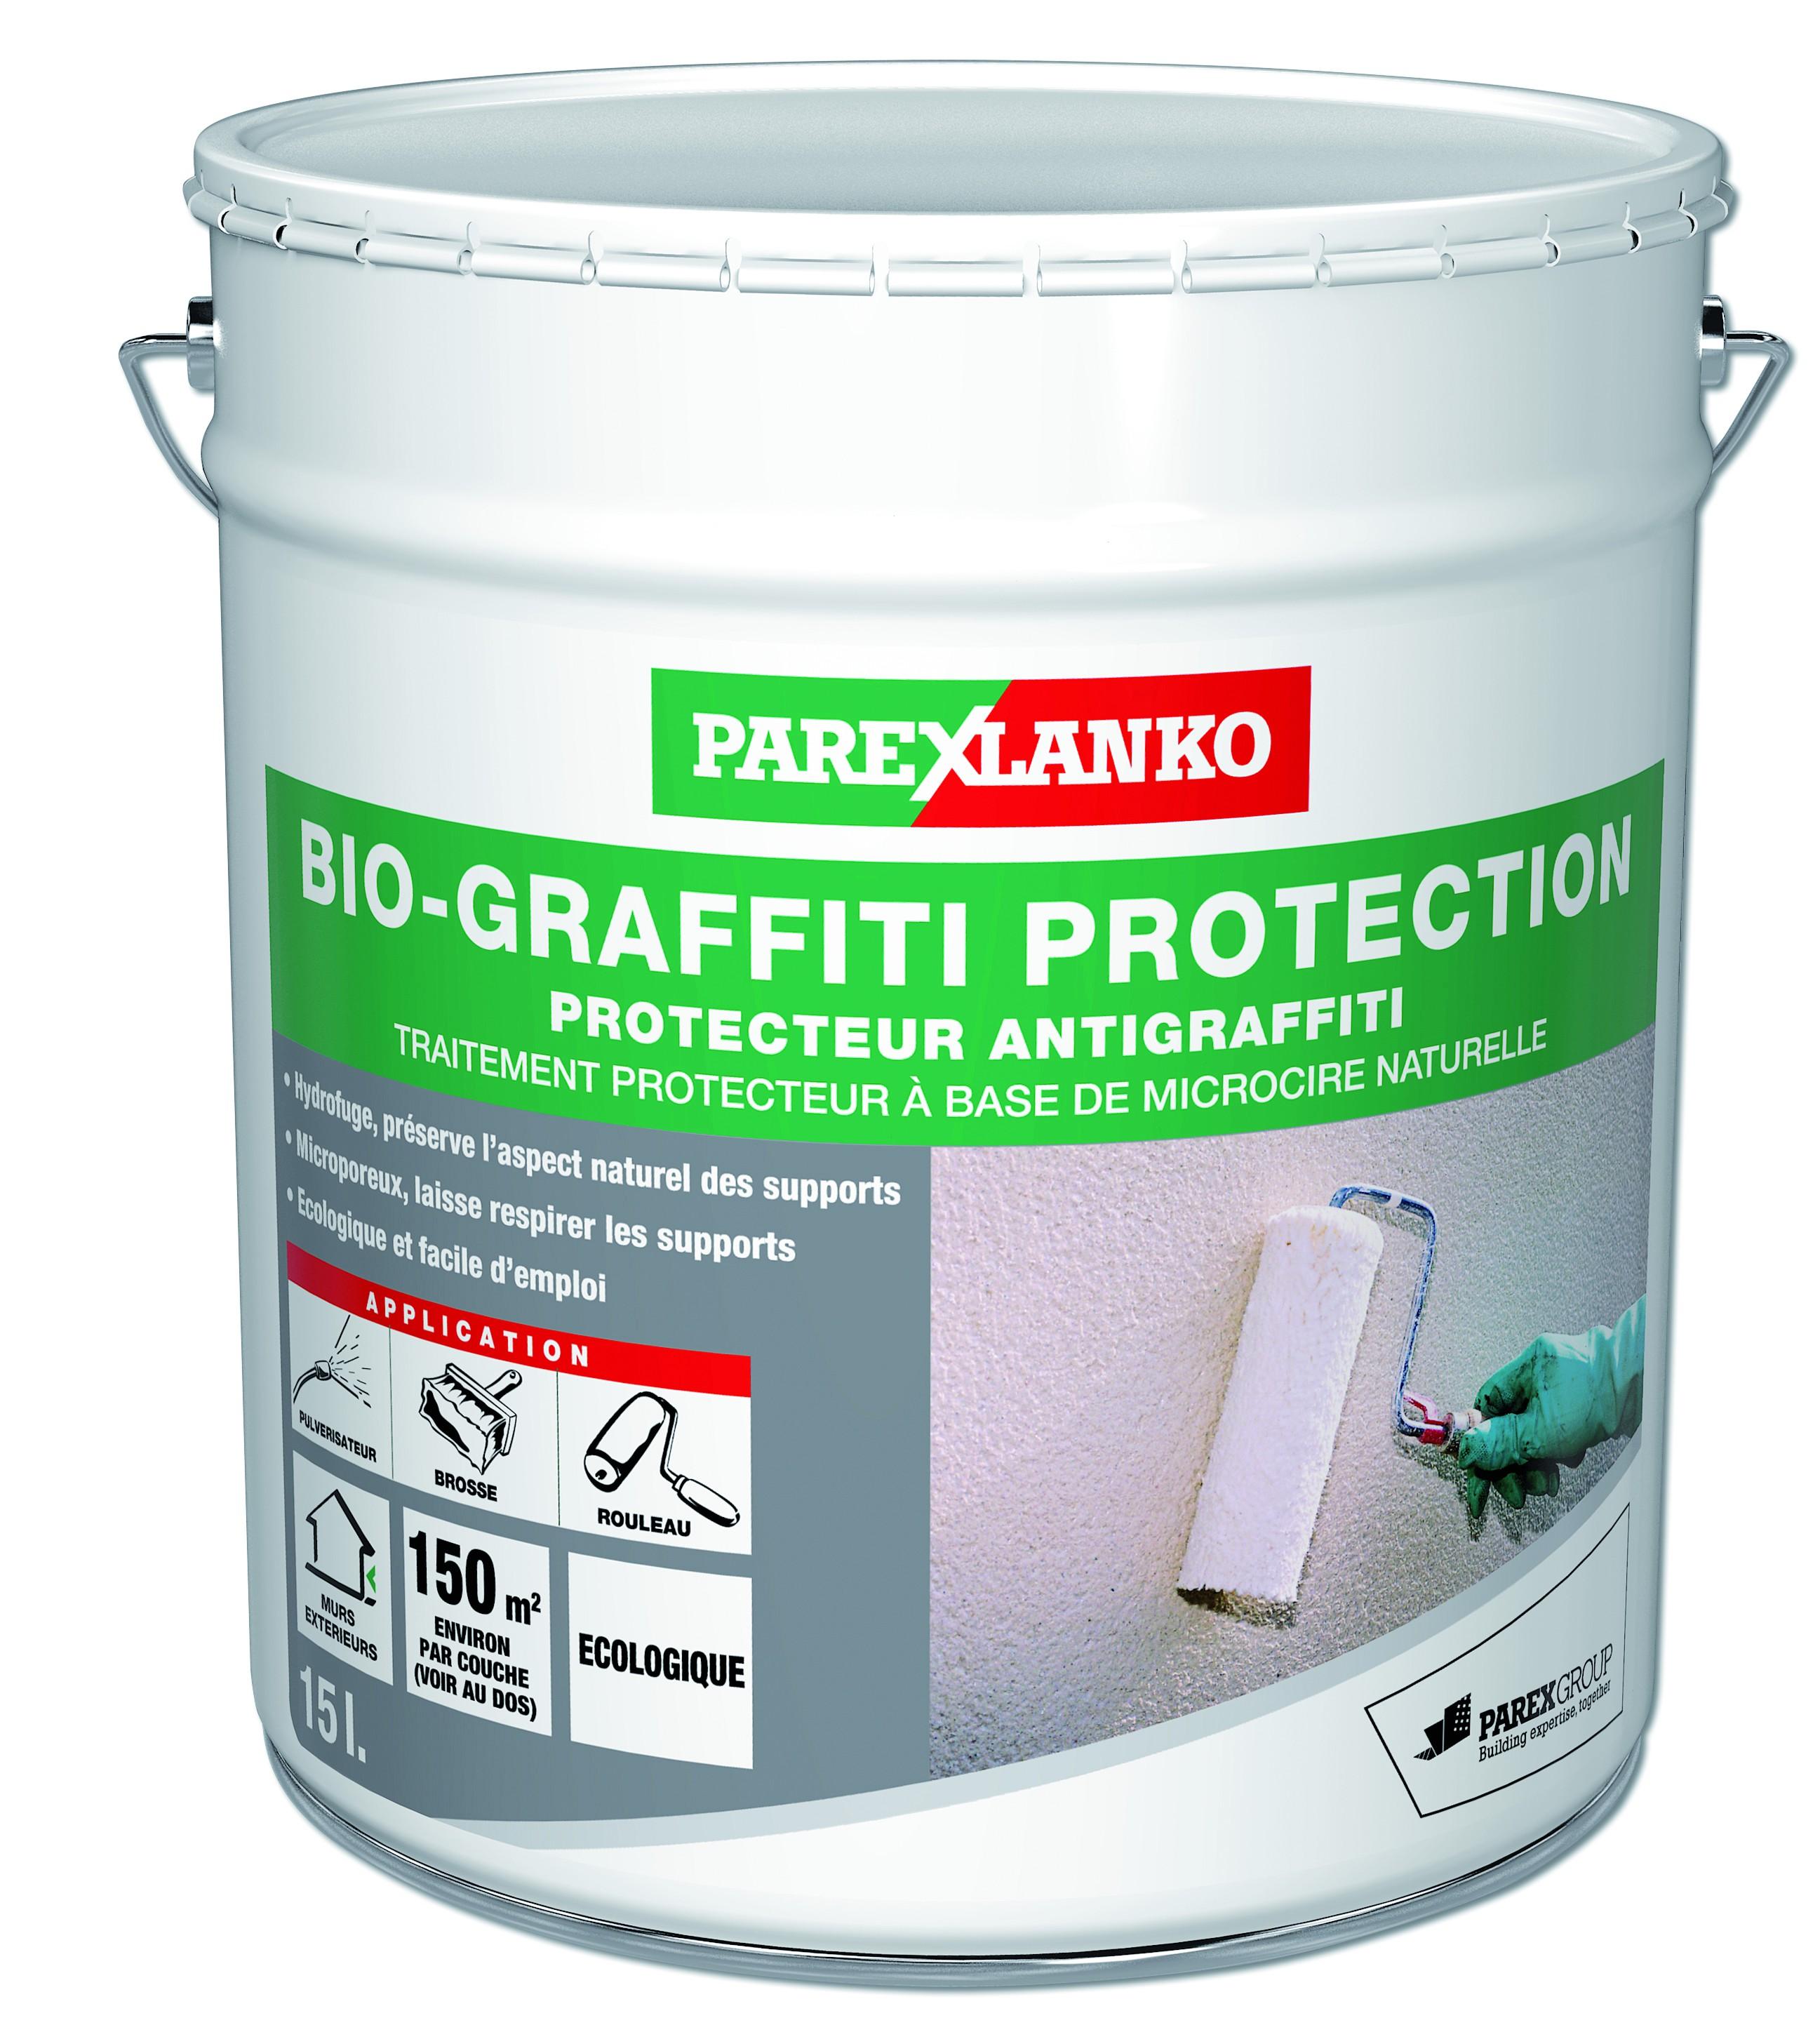 Protecteur anti-graffiti écologique Bio Graffiti Protection Parexlanko